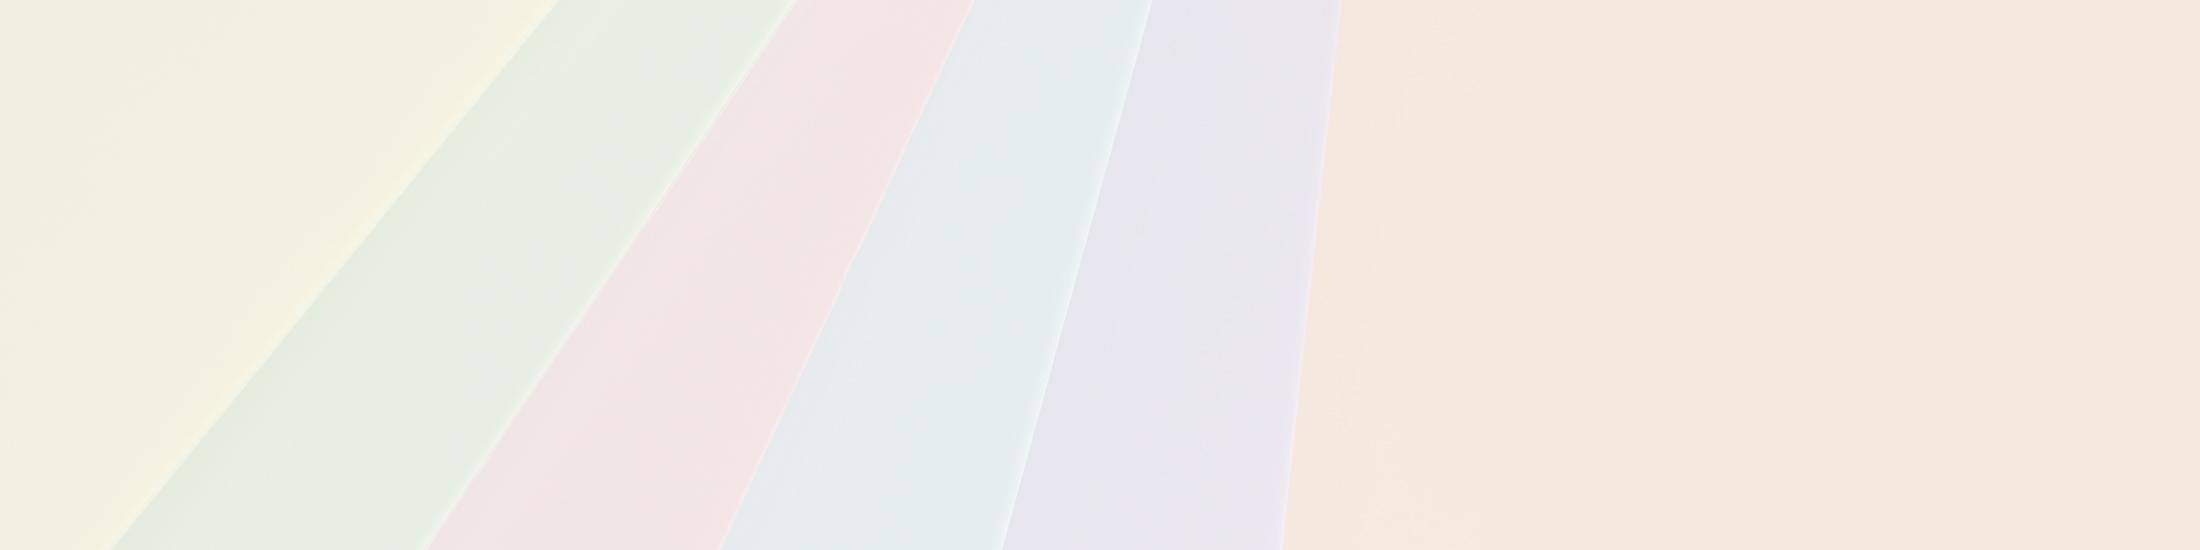 TroGlass acrylic sheets pastel